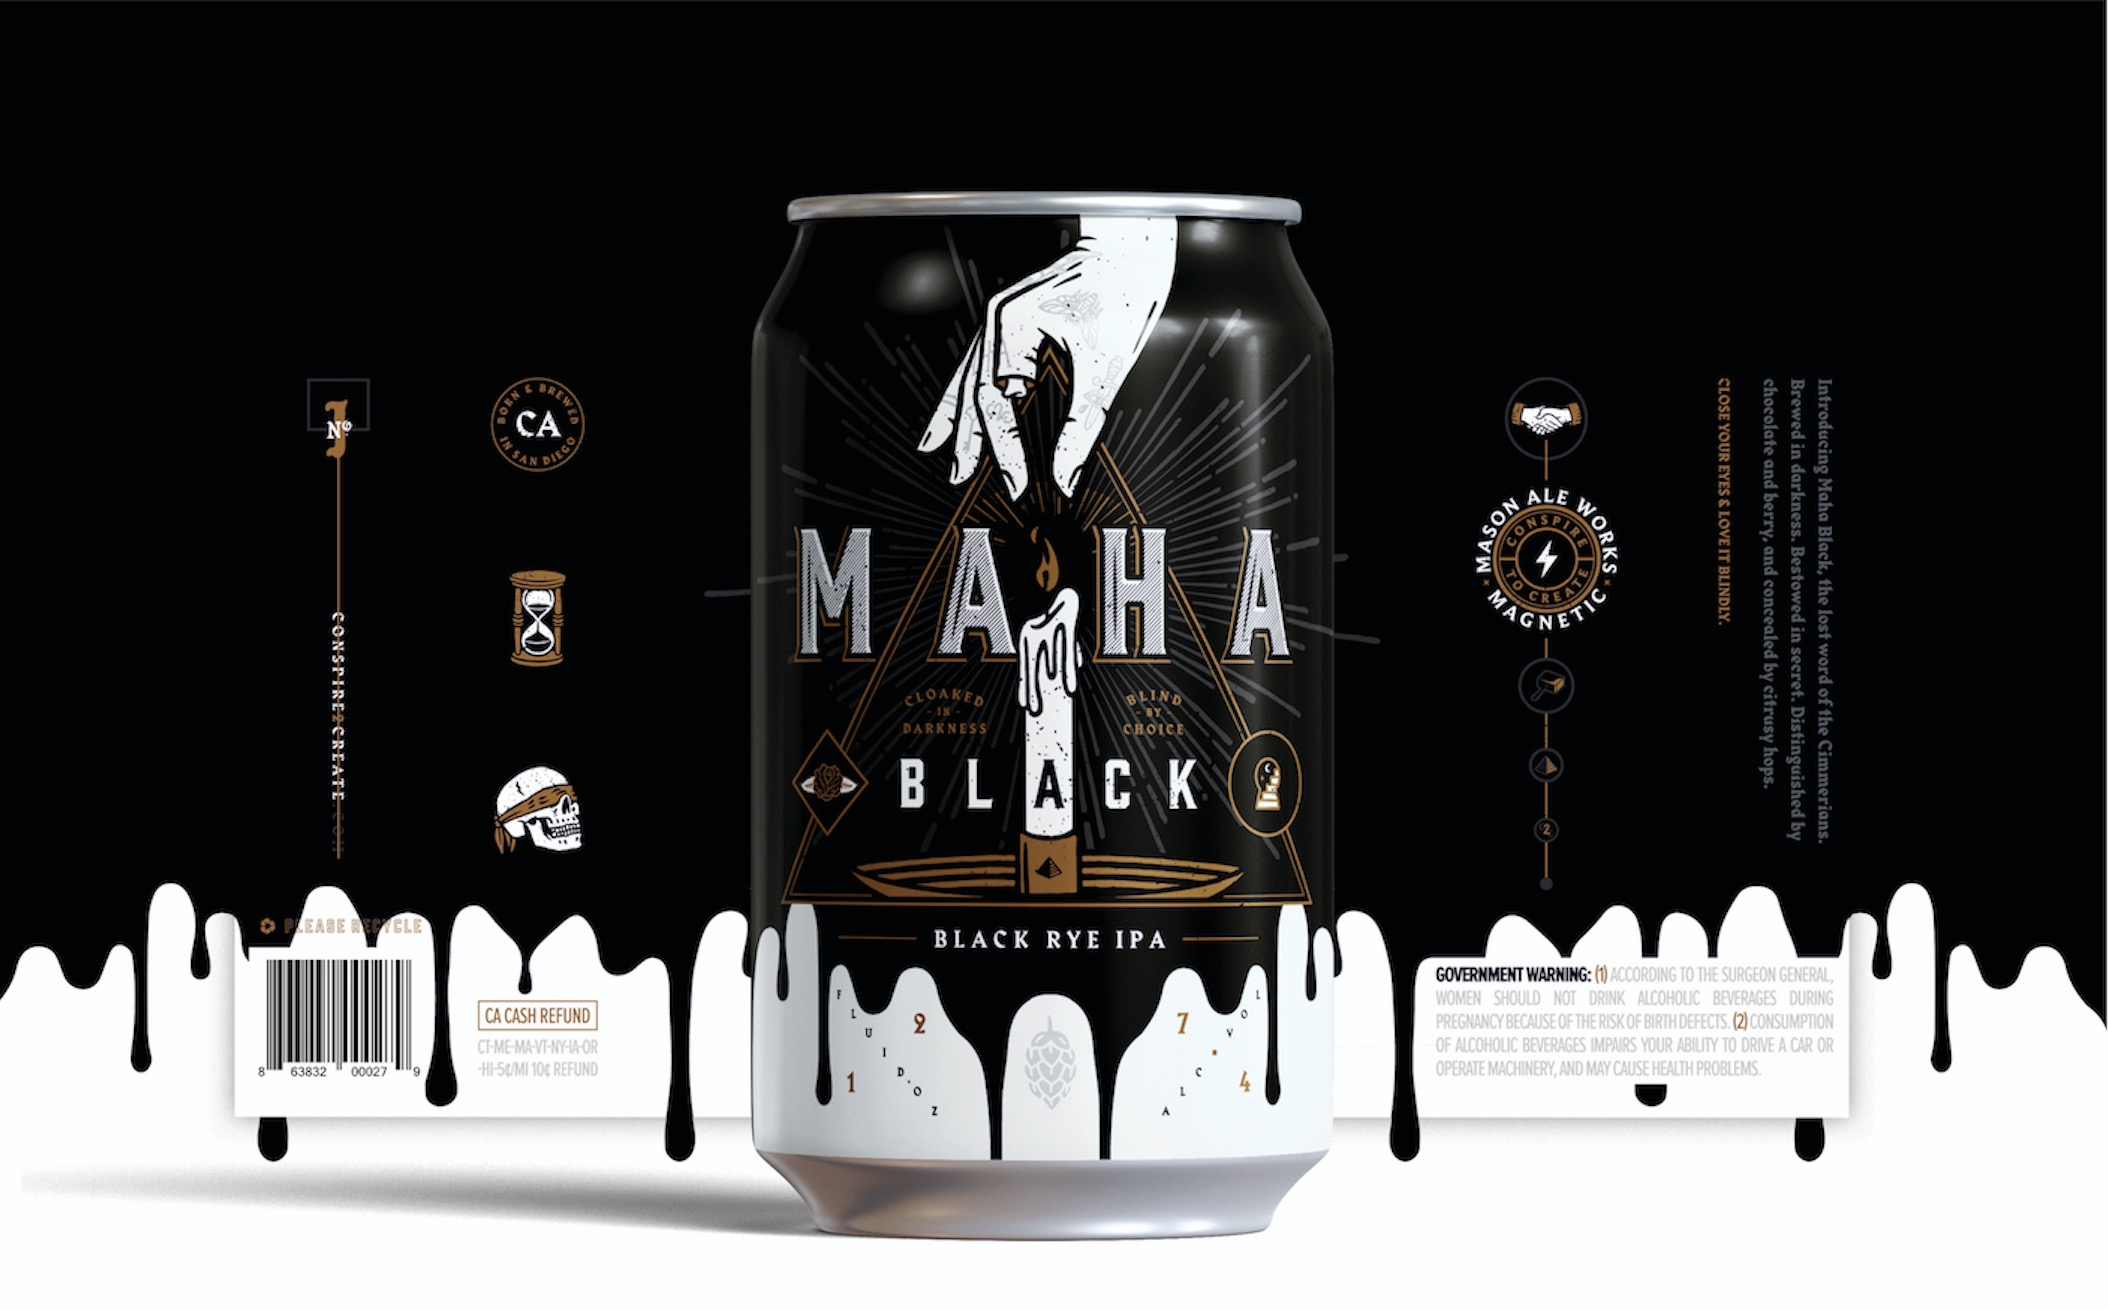 MAHA BLACK - Craft Beer Branding | Muse Awards